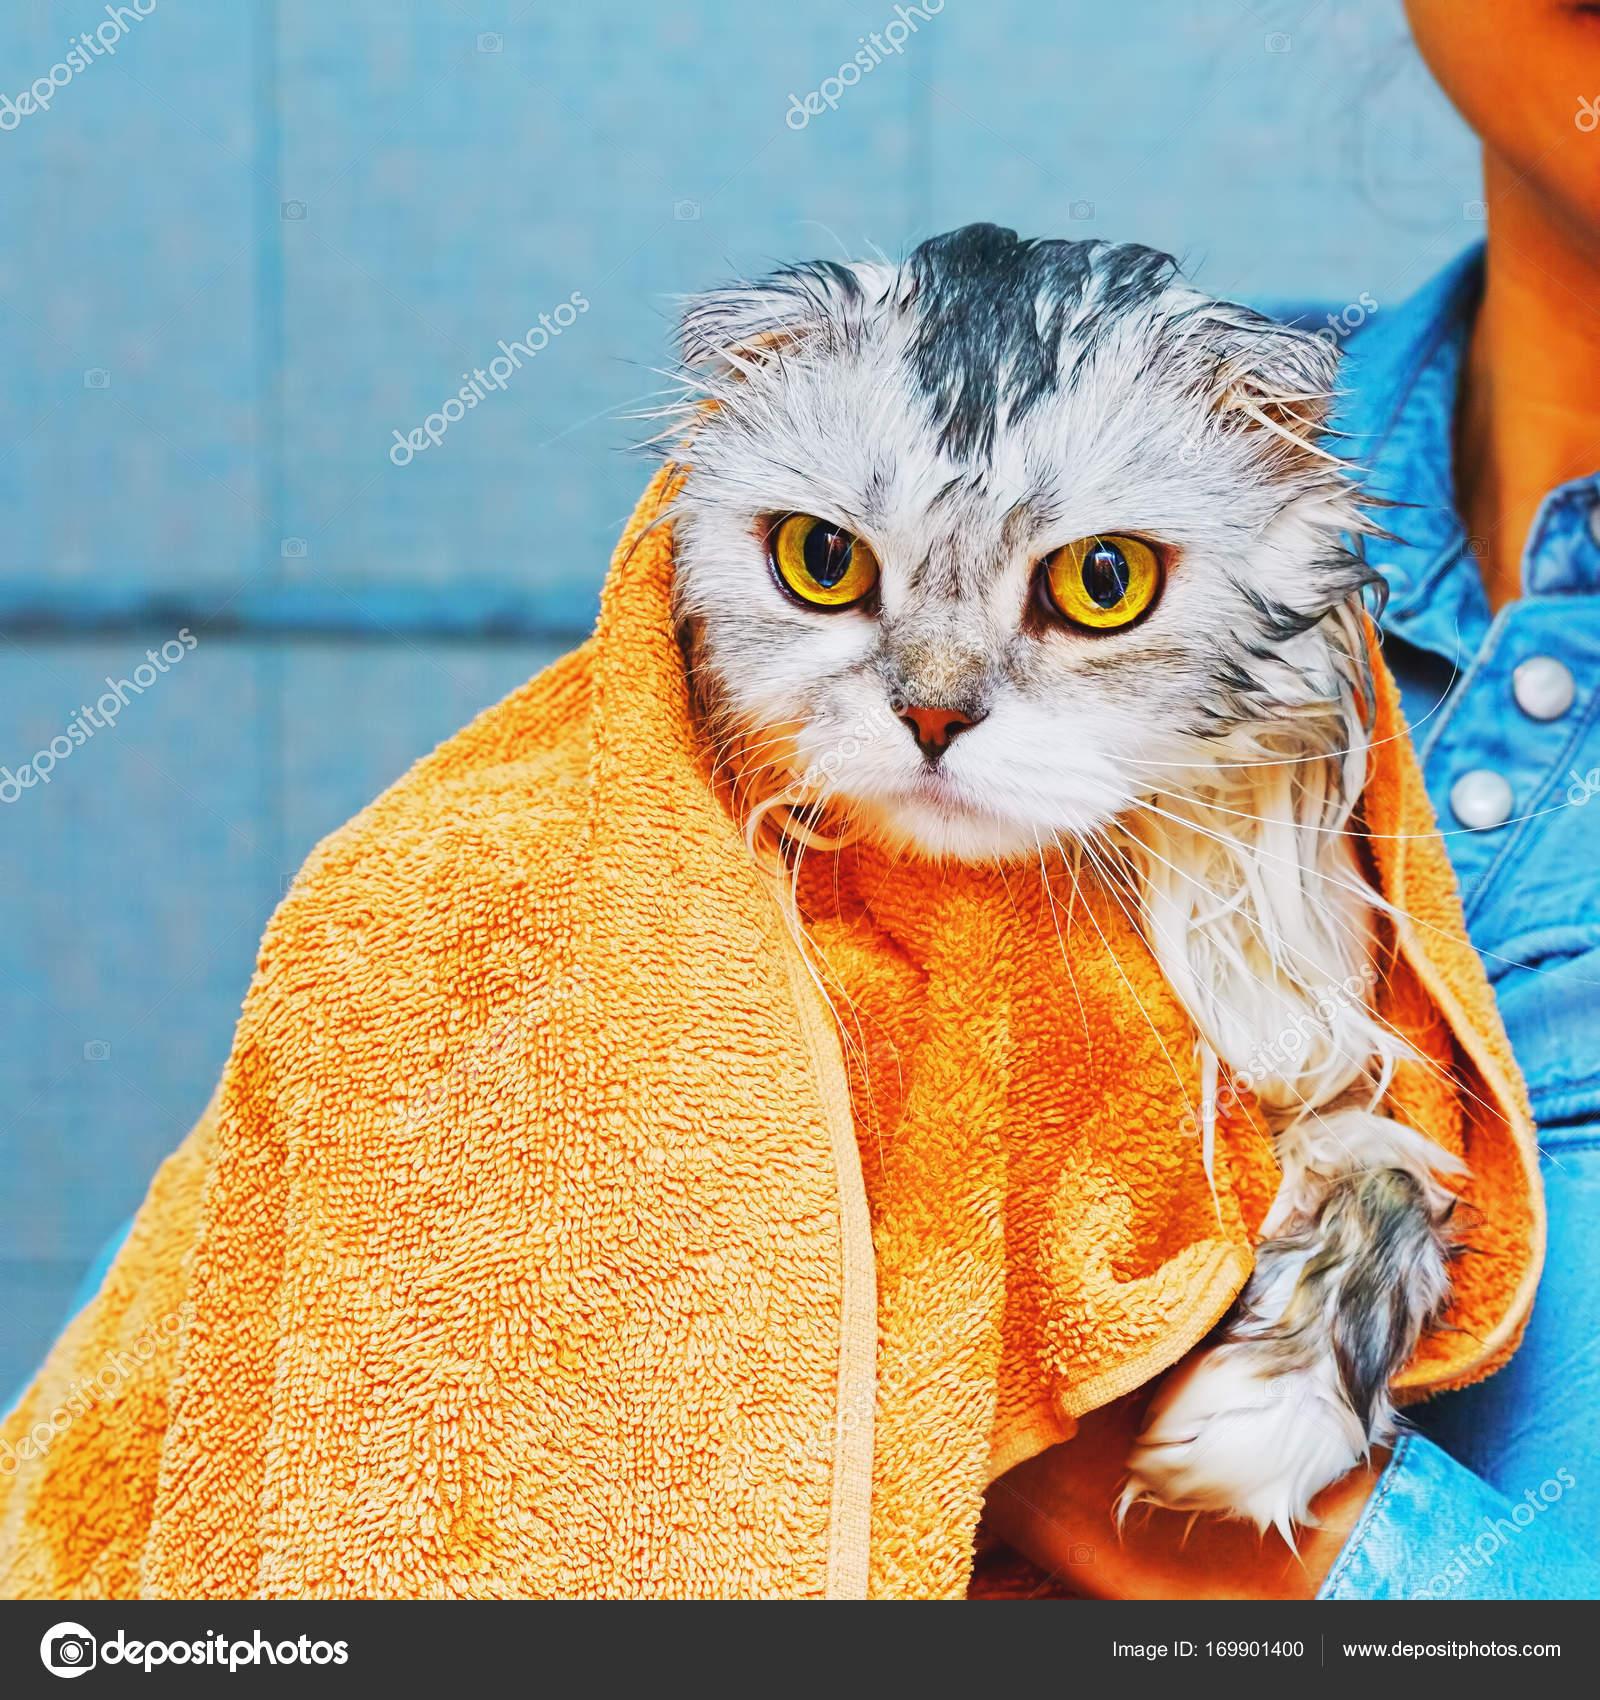 55b20248d830 LOP eared σκωτσέζικο higland γάτα υγρό και απόλυτα δυσαρεστημένος μετά το  πλύσιμο και το μπάνιο τυλιγμένη με πετσέτα μπάνιου. Πλατεία σύλληψη —  Εικόνα από ...